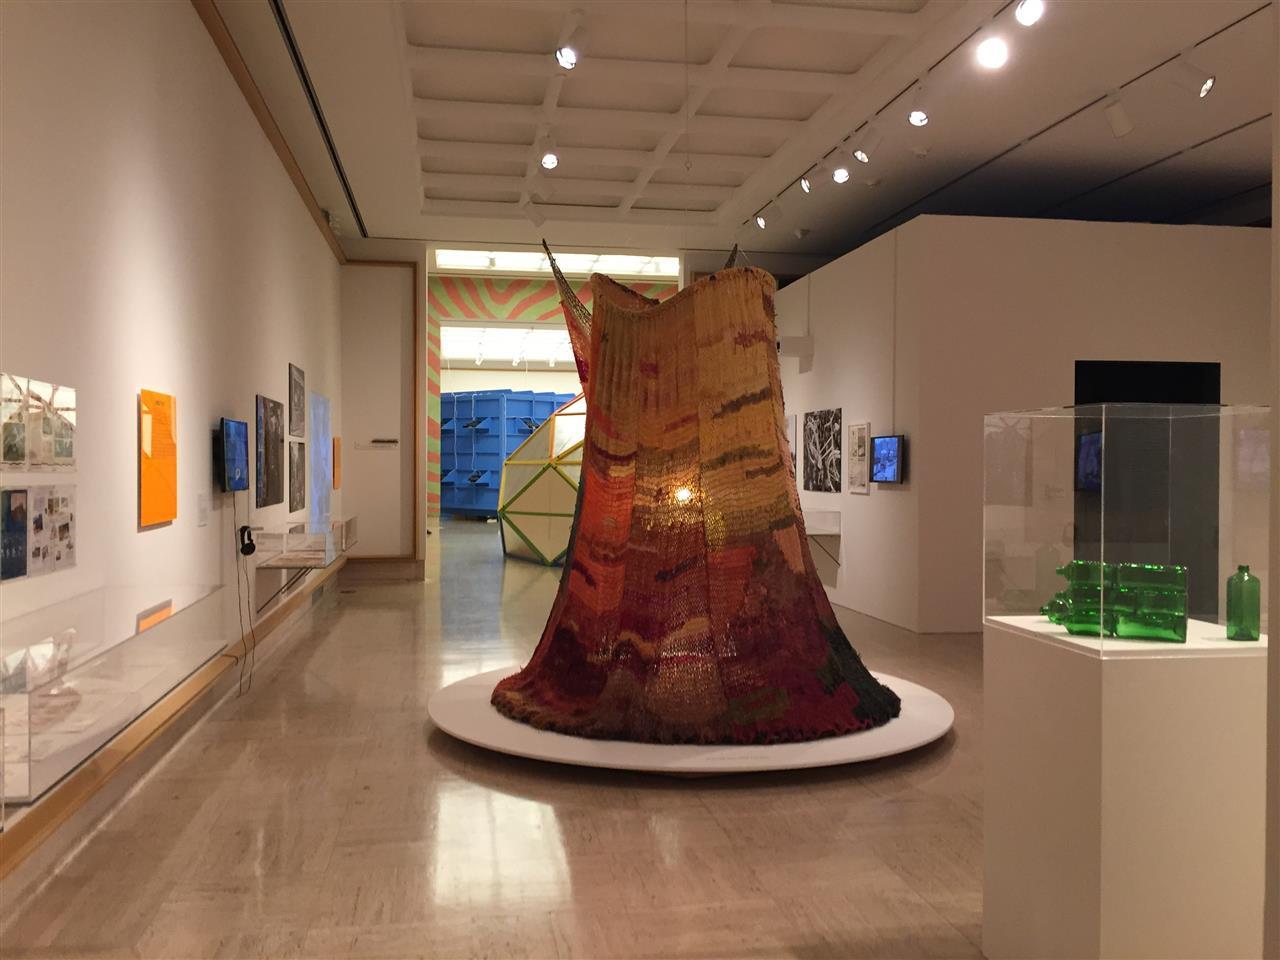 """Hippie Modernism"" exhibit at the Cranbrook Art Museum, which opened in its current Eliel Saarinen-designed building in 1942.  #BloomfieldHills #Michigan"